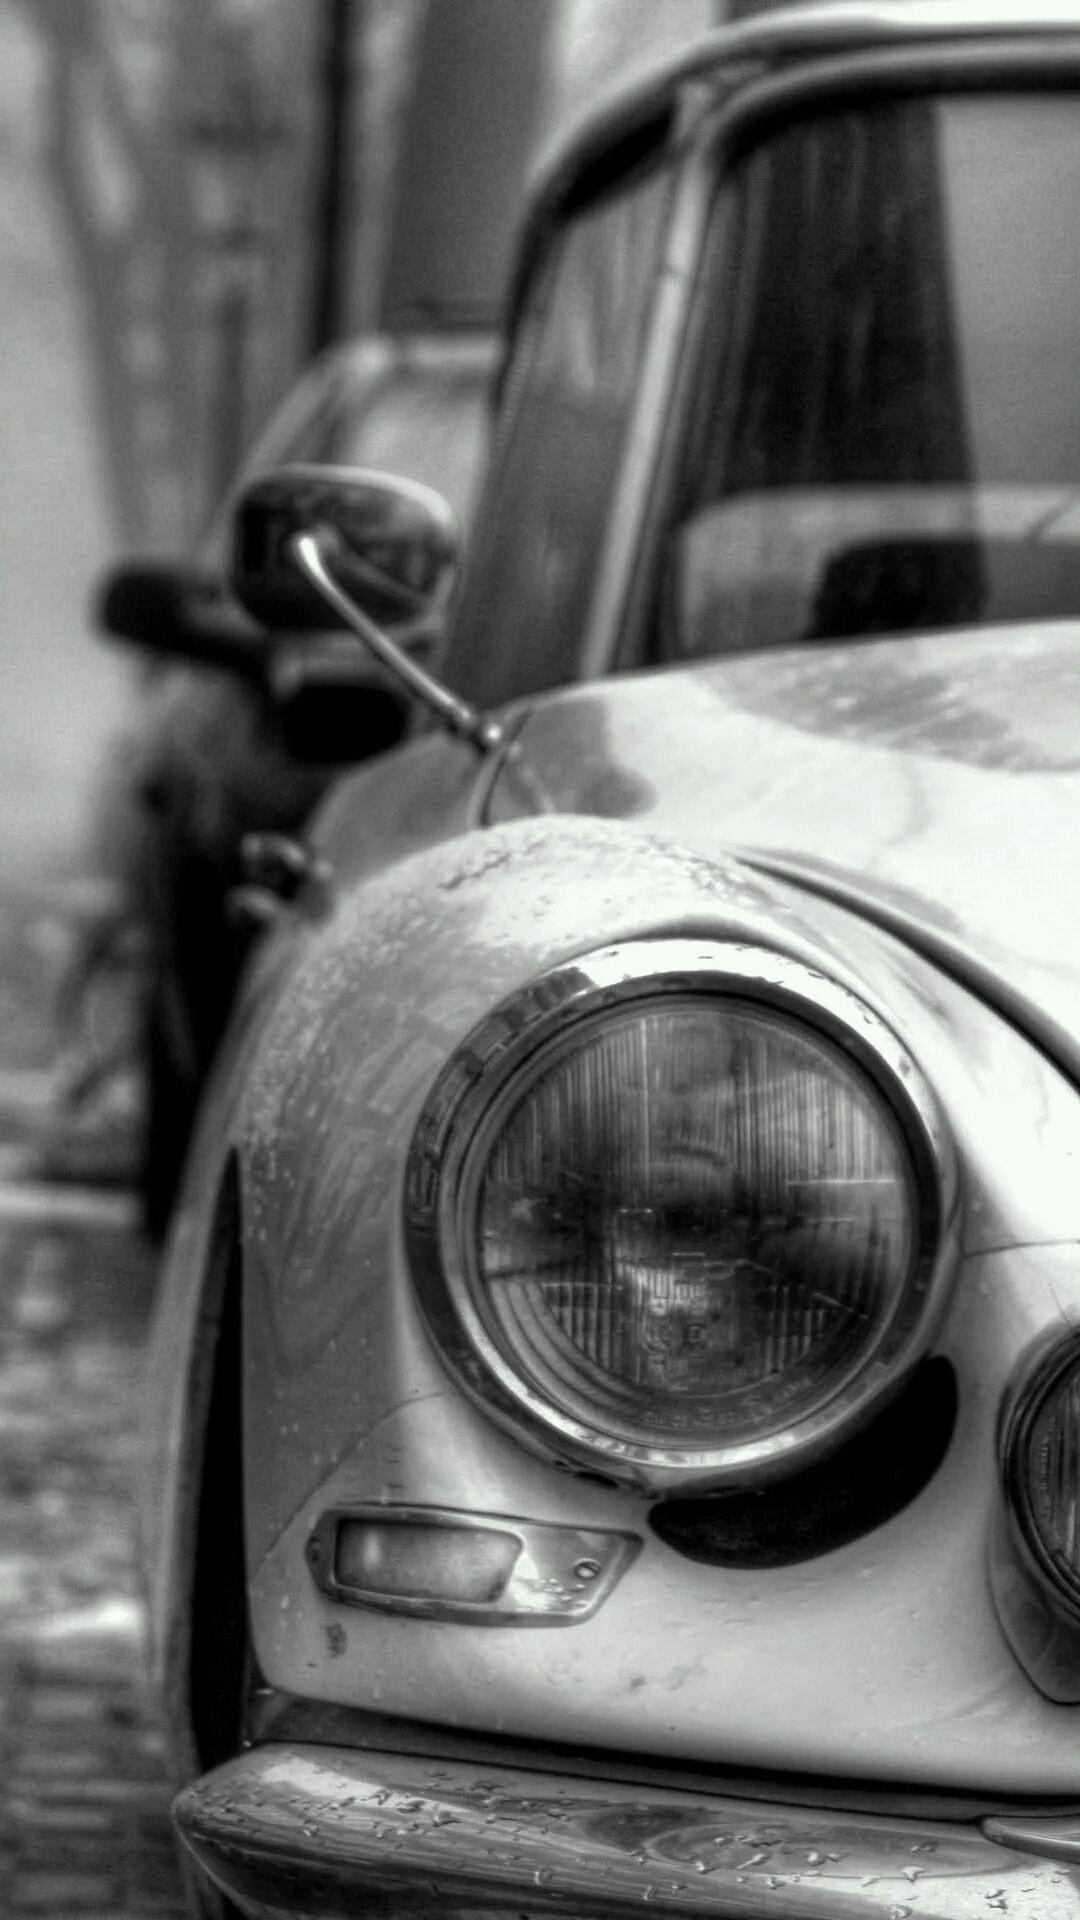 Vintage Car Iphone Wallpaper